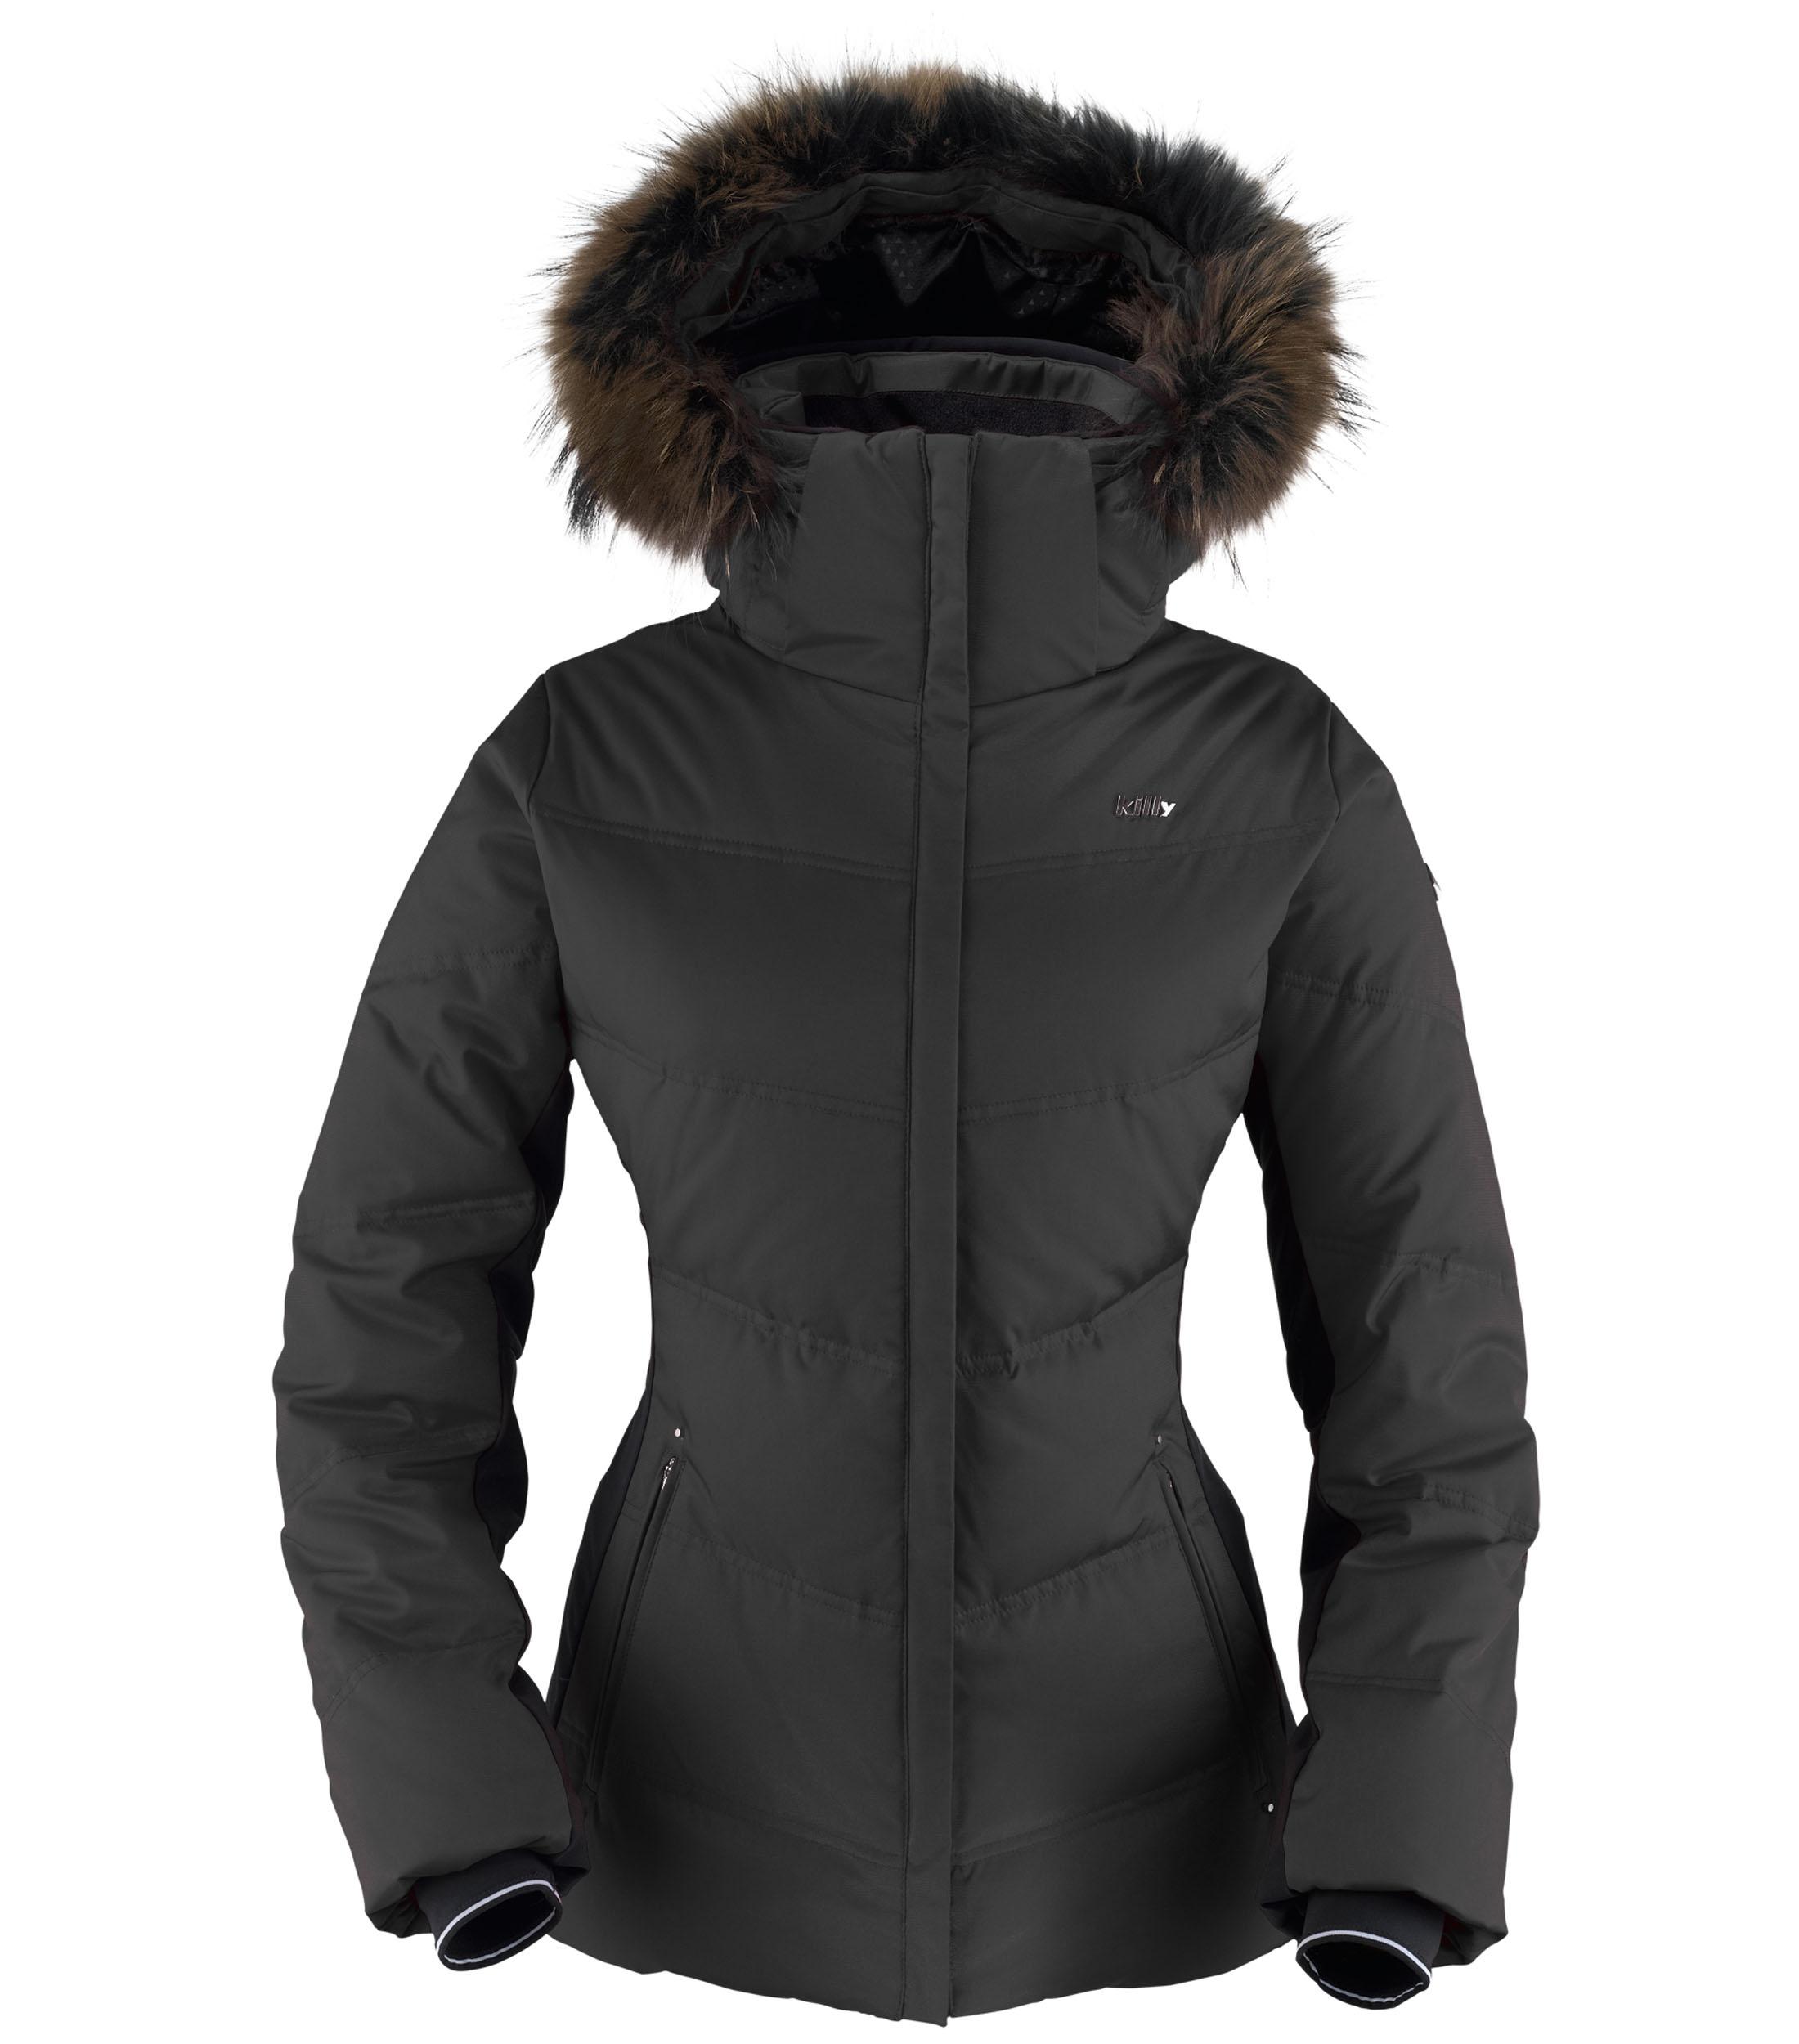 Killy ski jackets sale uk